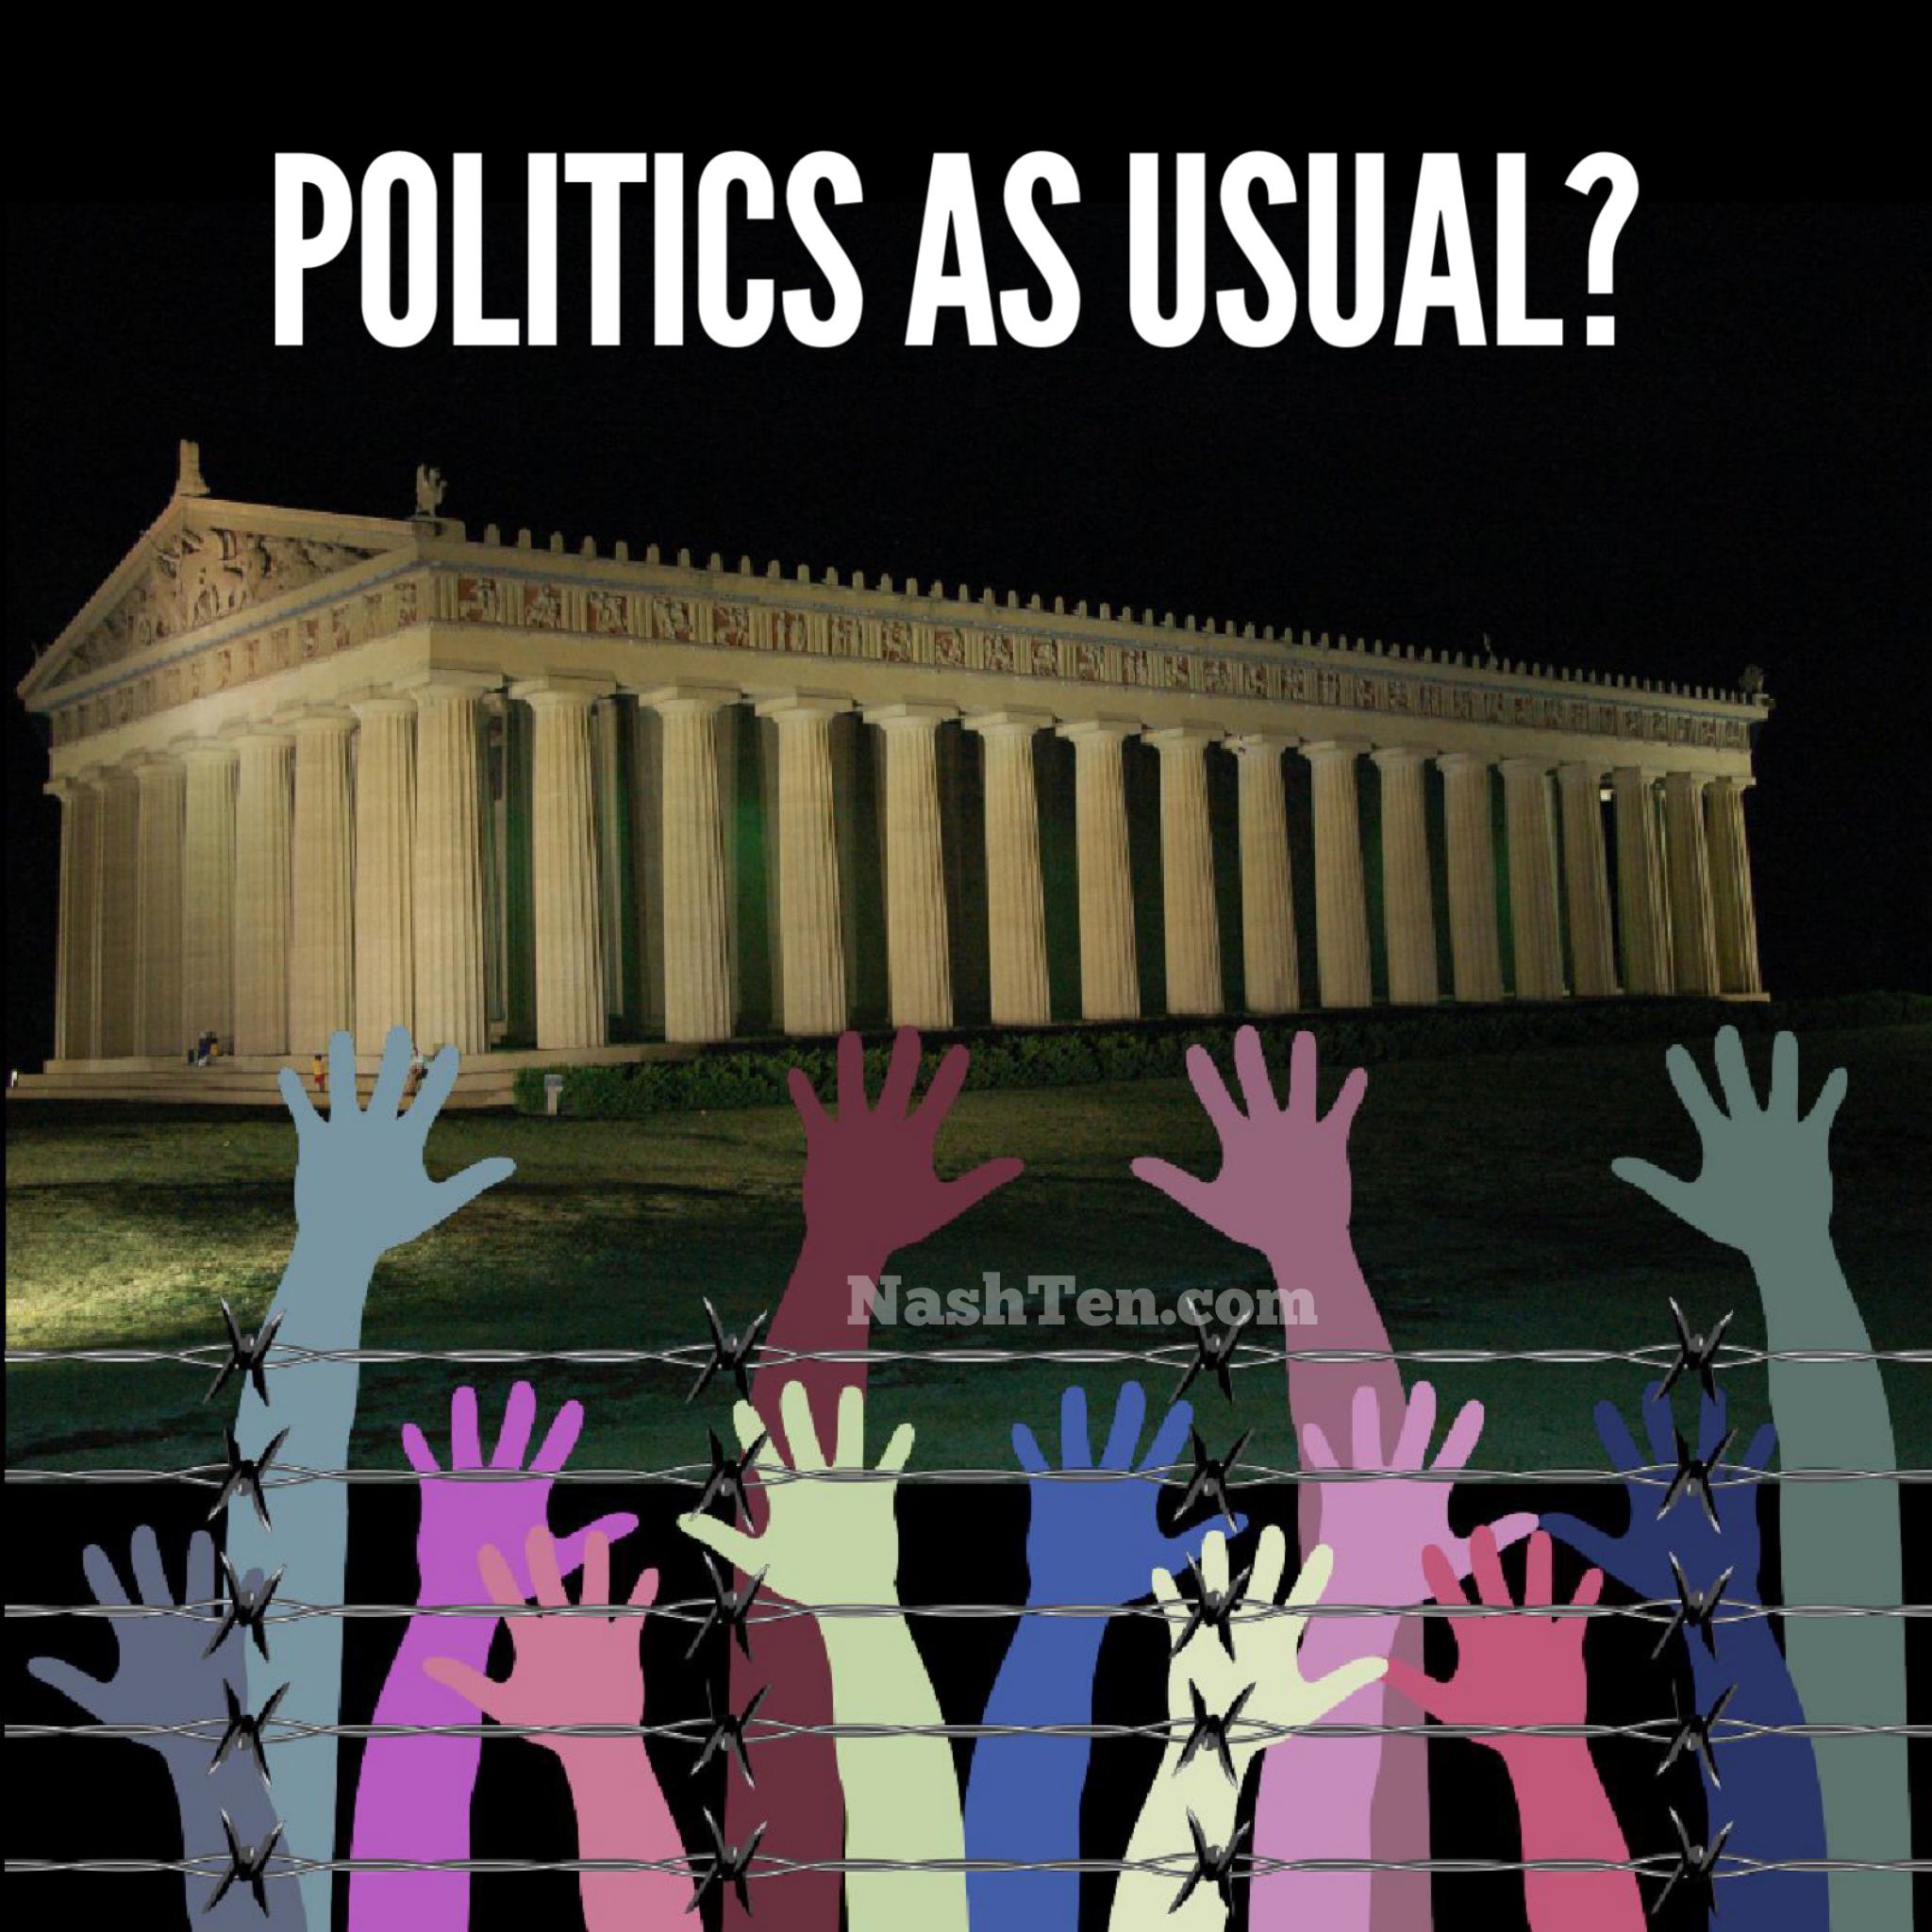 Nashville politics as usual?